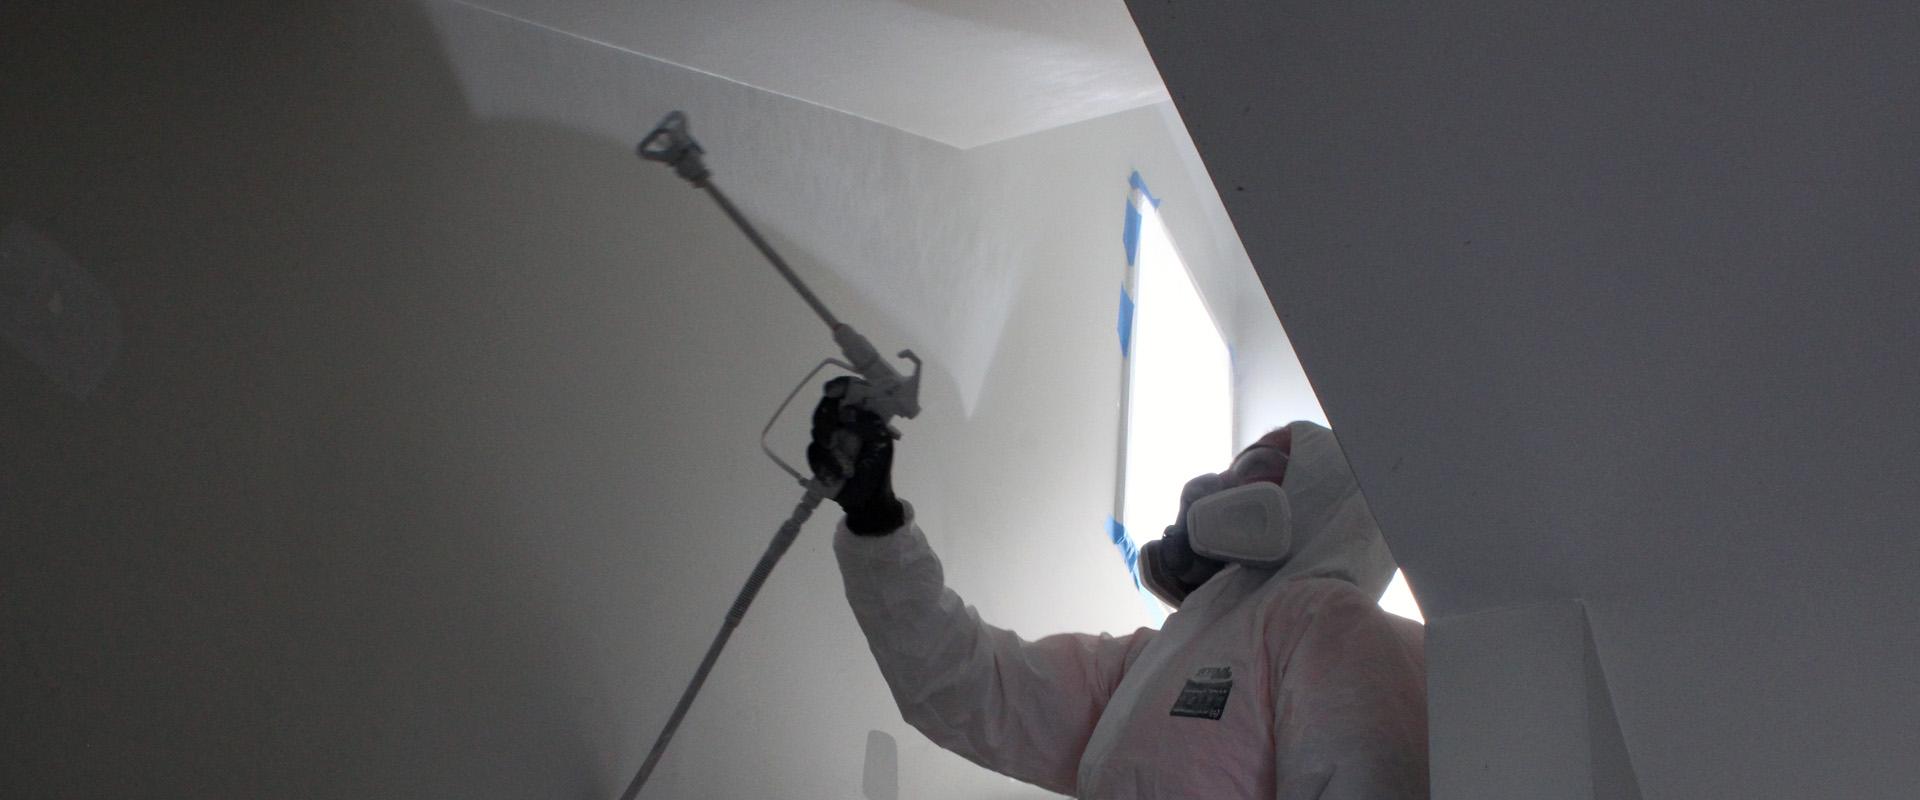 Carus Group Interior Spraying